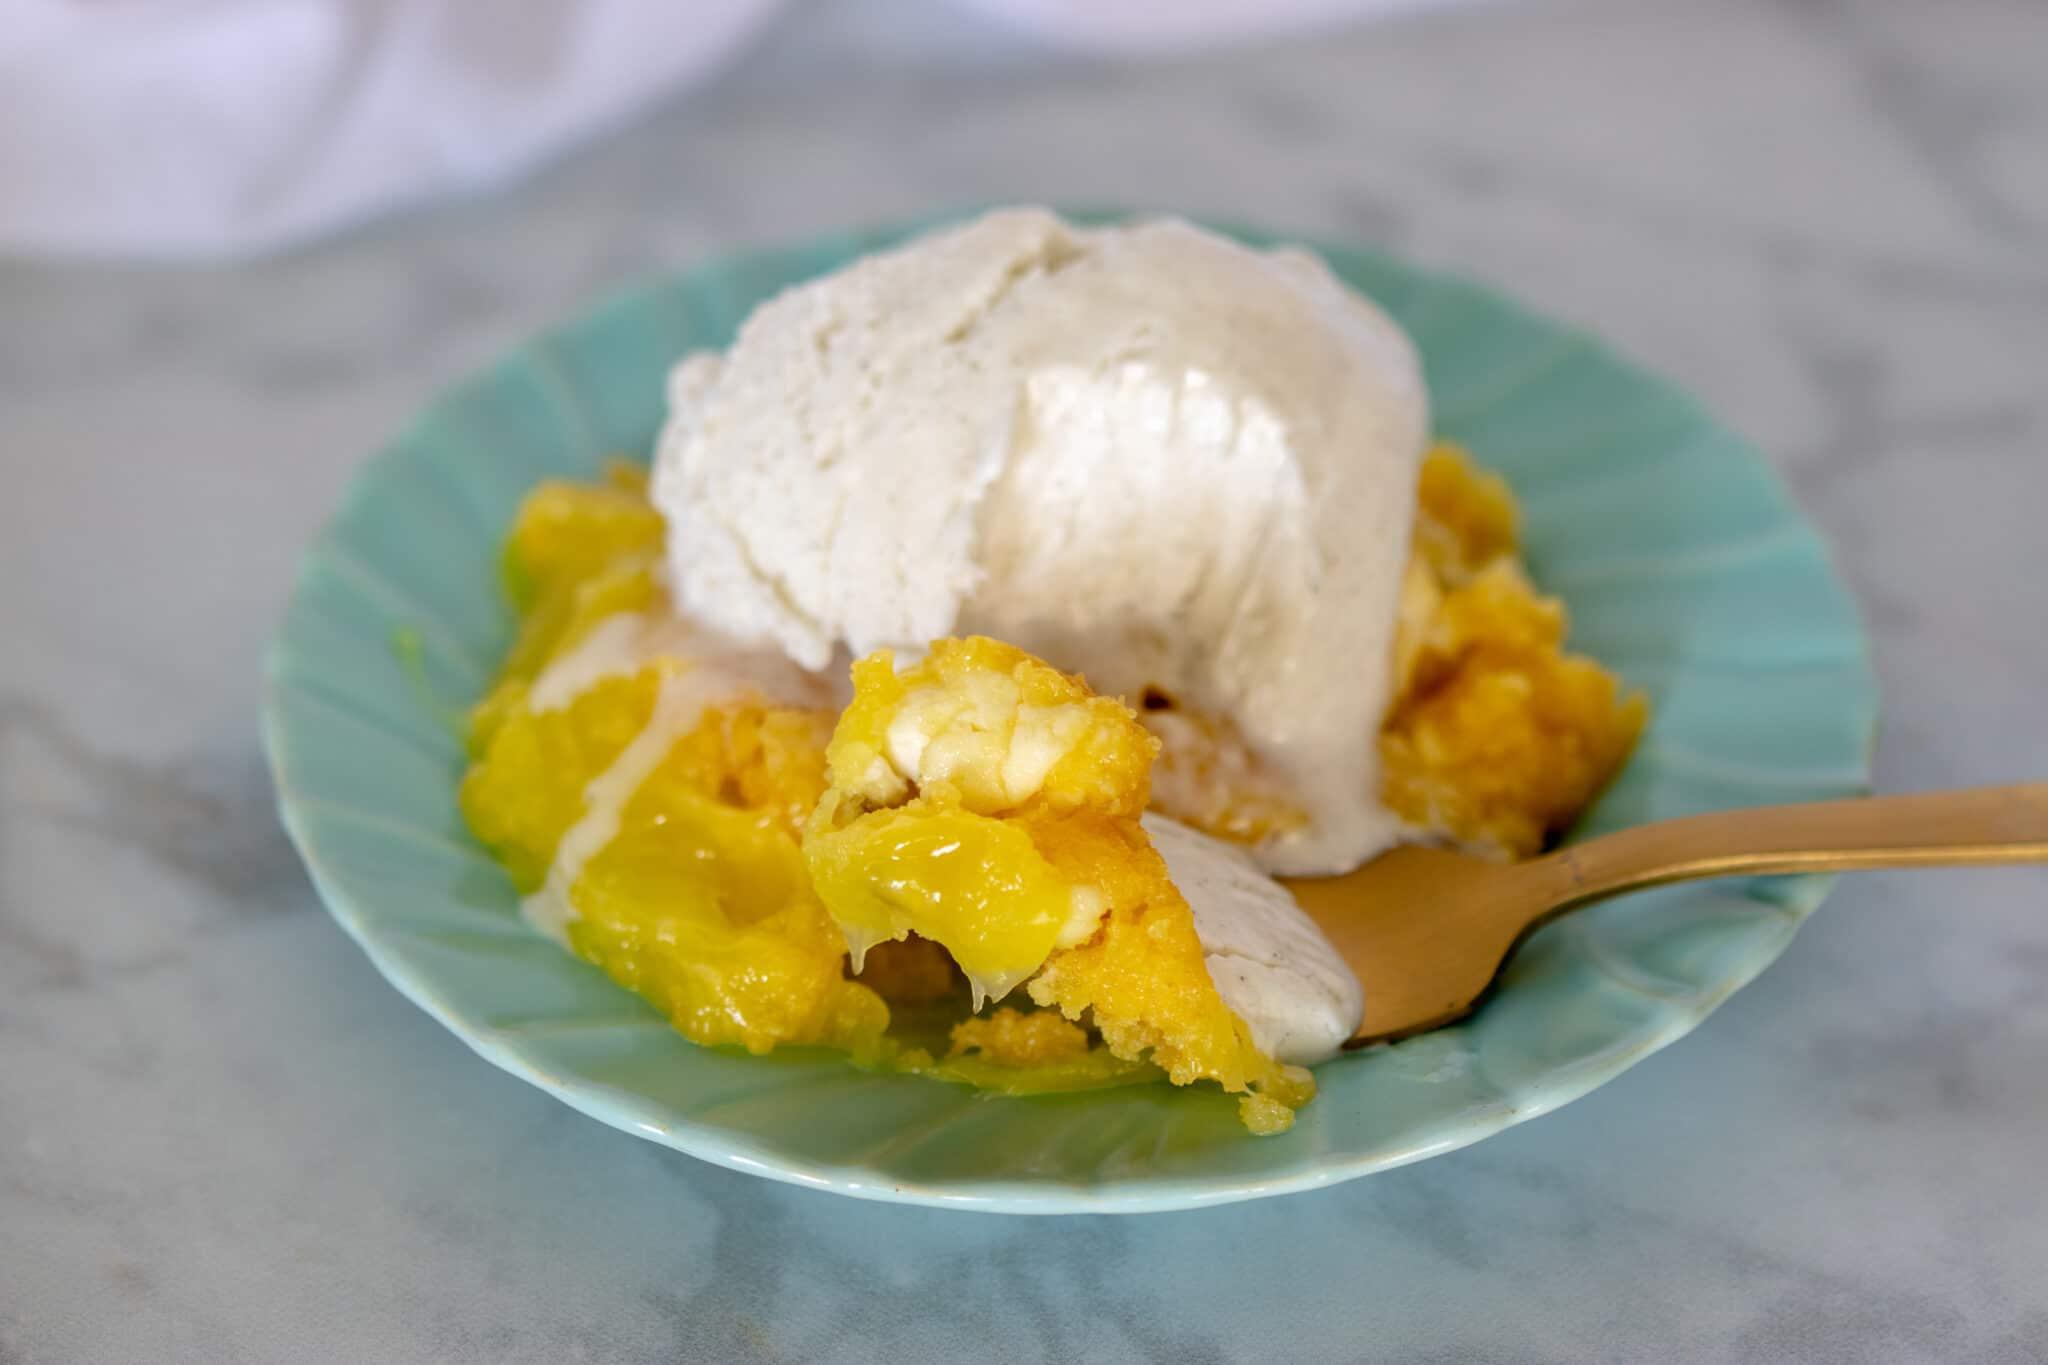 Instant Pot Lemon Cream Cheese Dump Cake